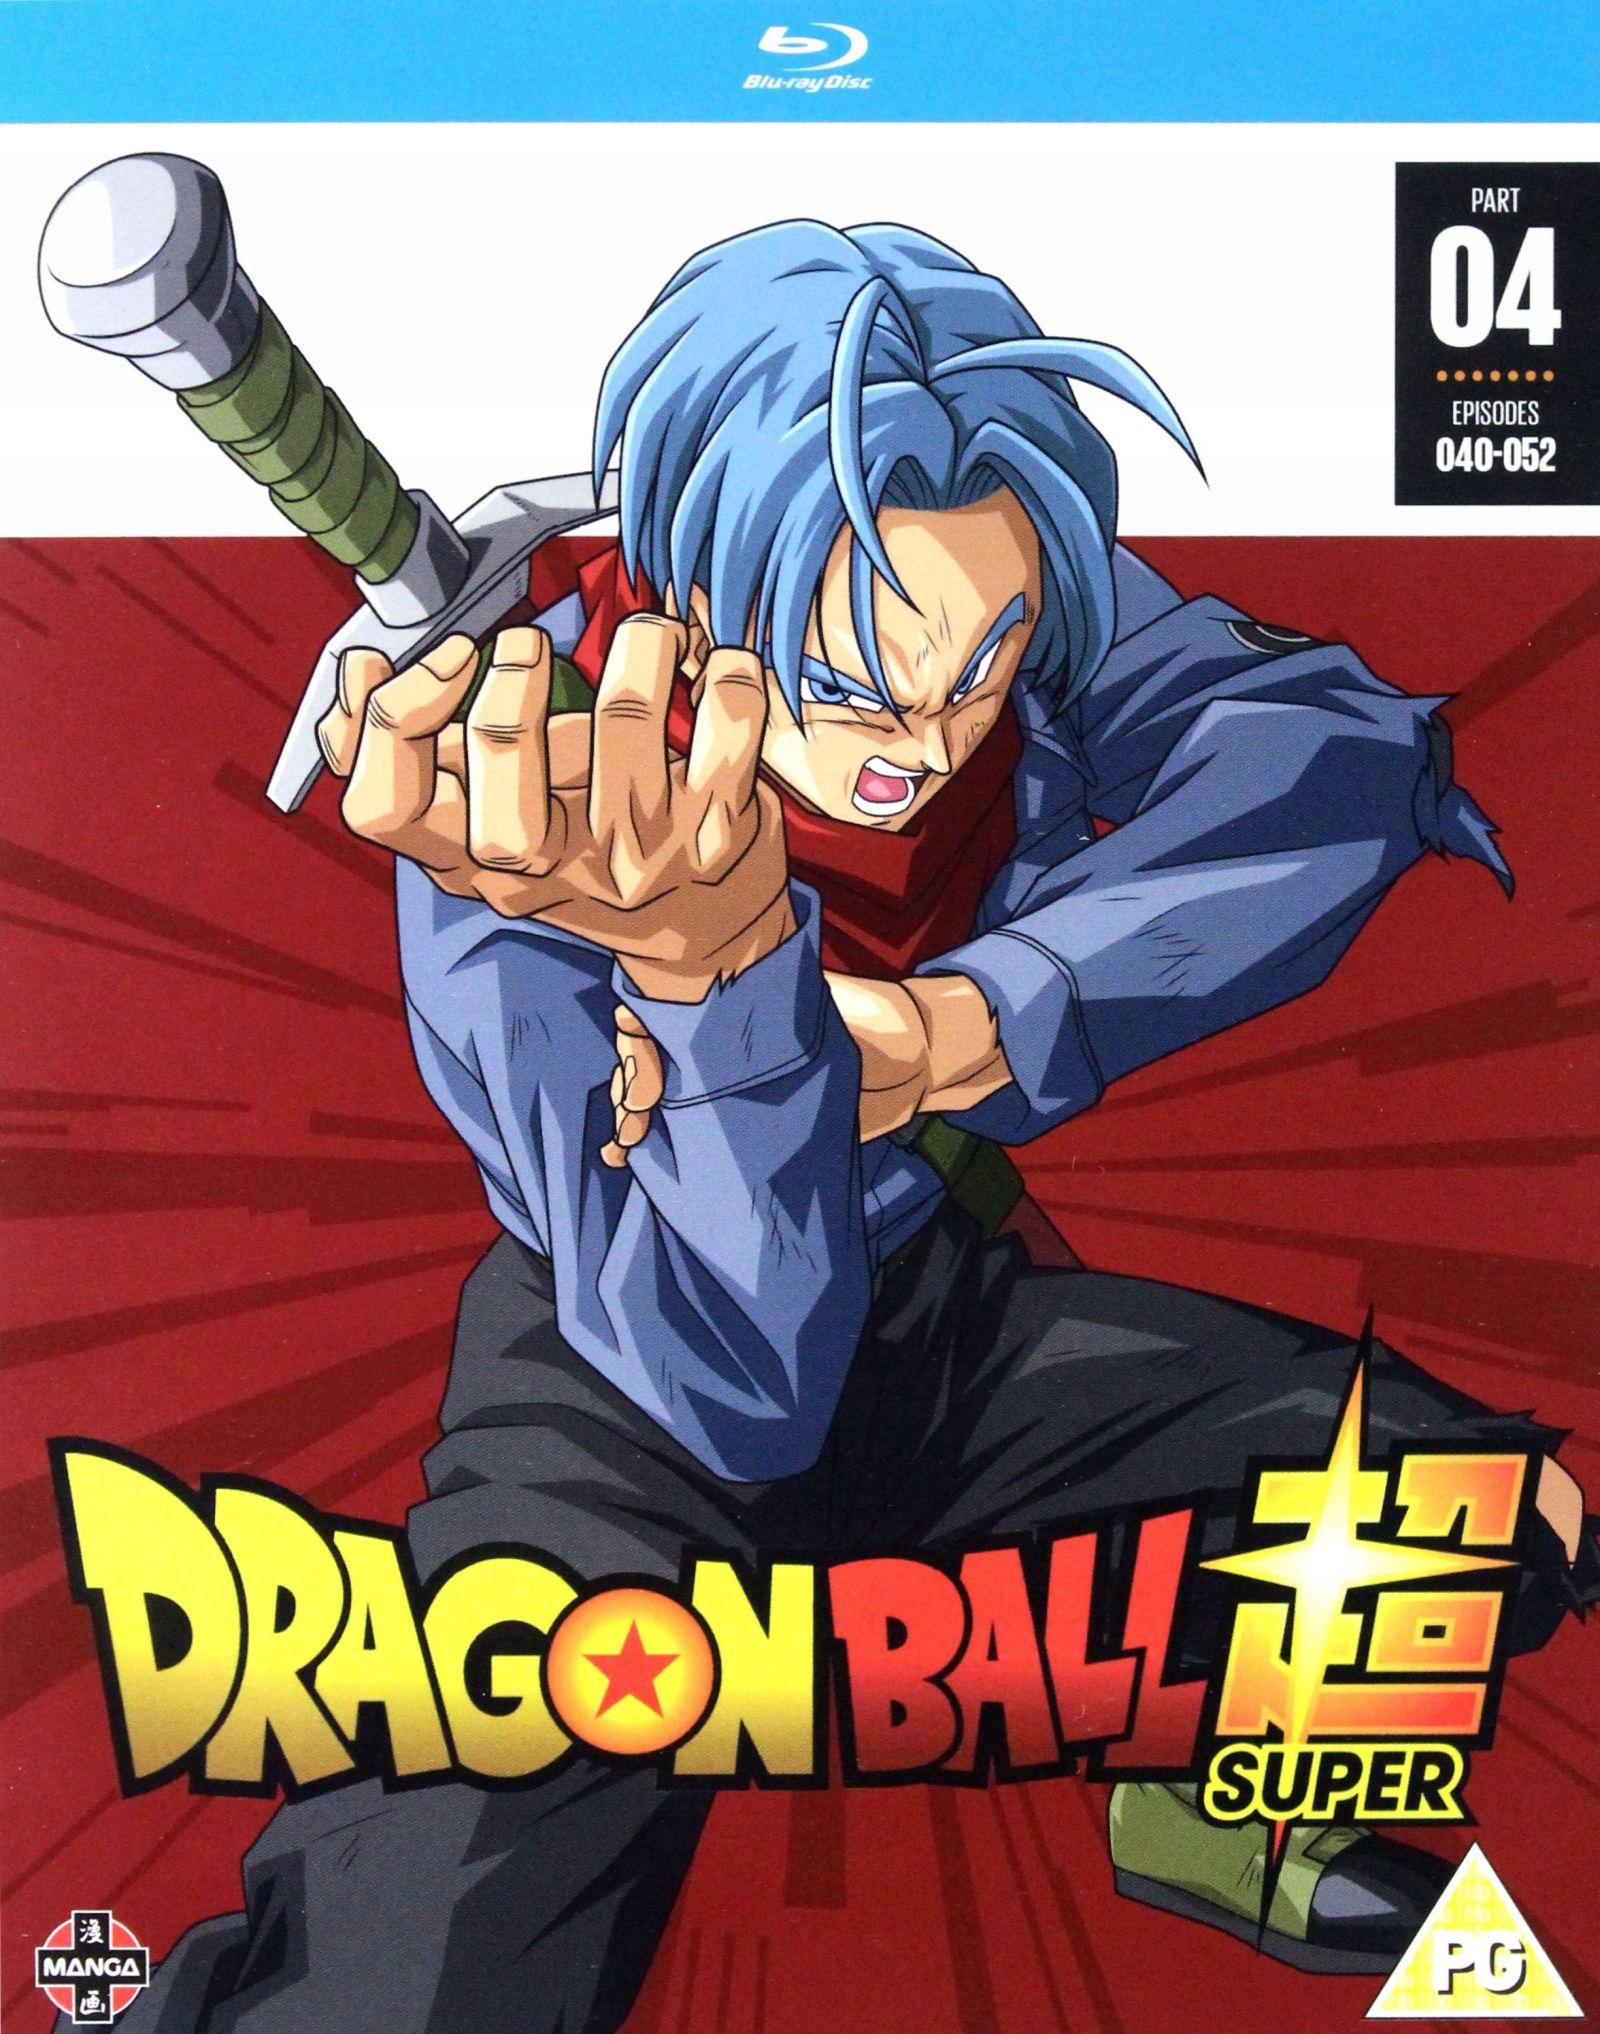 DRAGON BALL SUPER PART 4 (EPISODES 40-52) (EN) 2XB